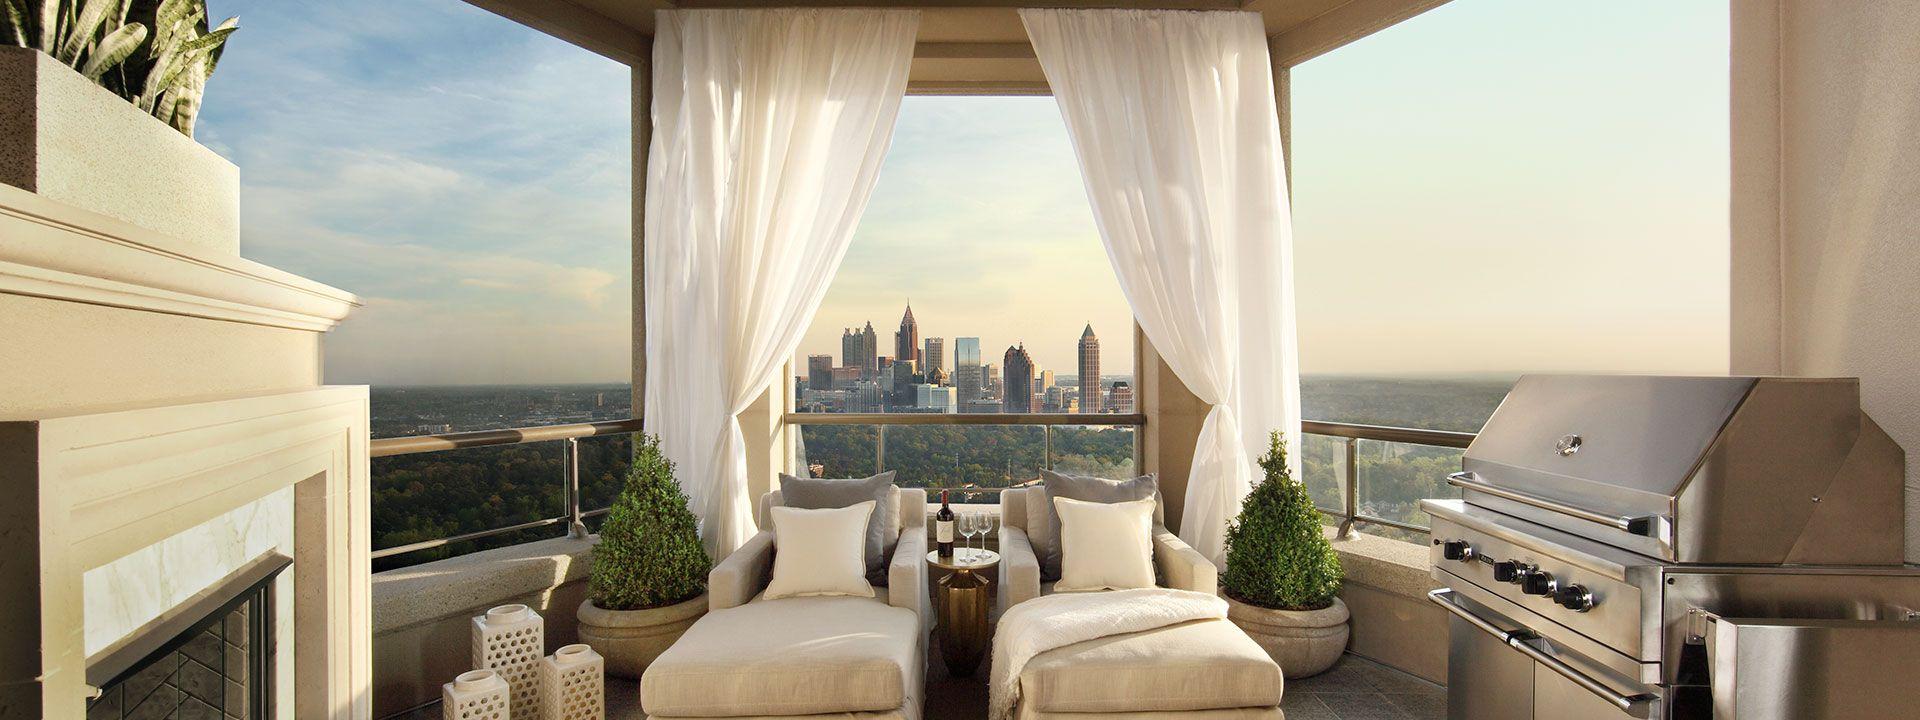 Beau Buckhead Condos For Sale   Condo For Sale In Atlanta Ga | Mandarin .